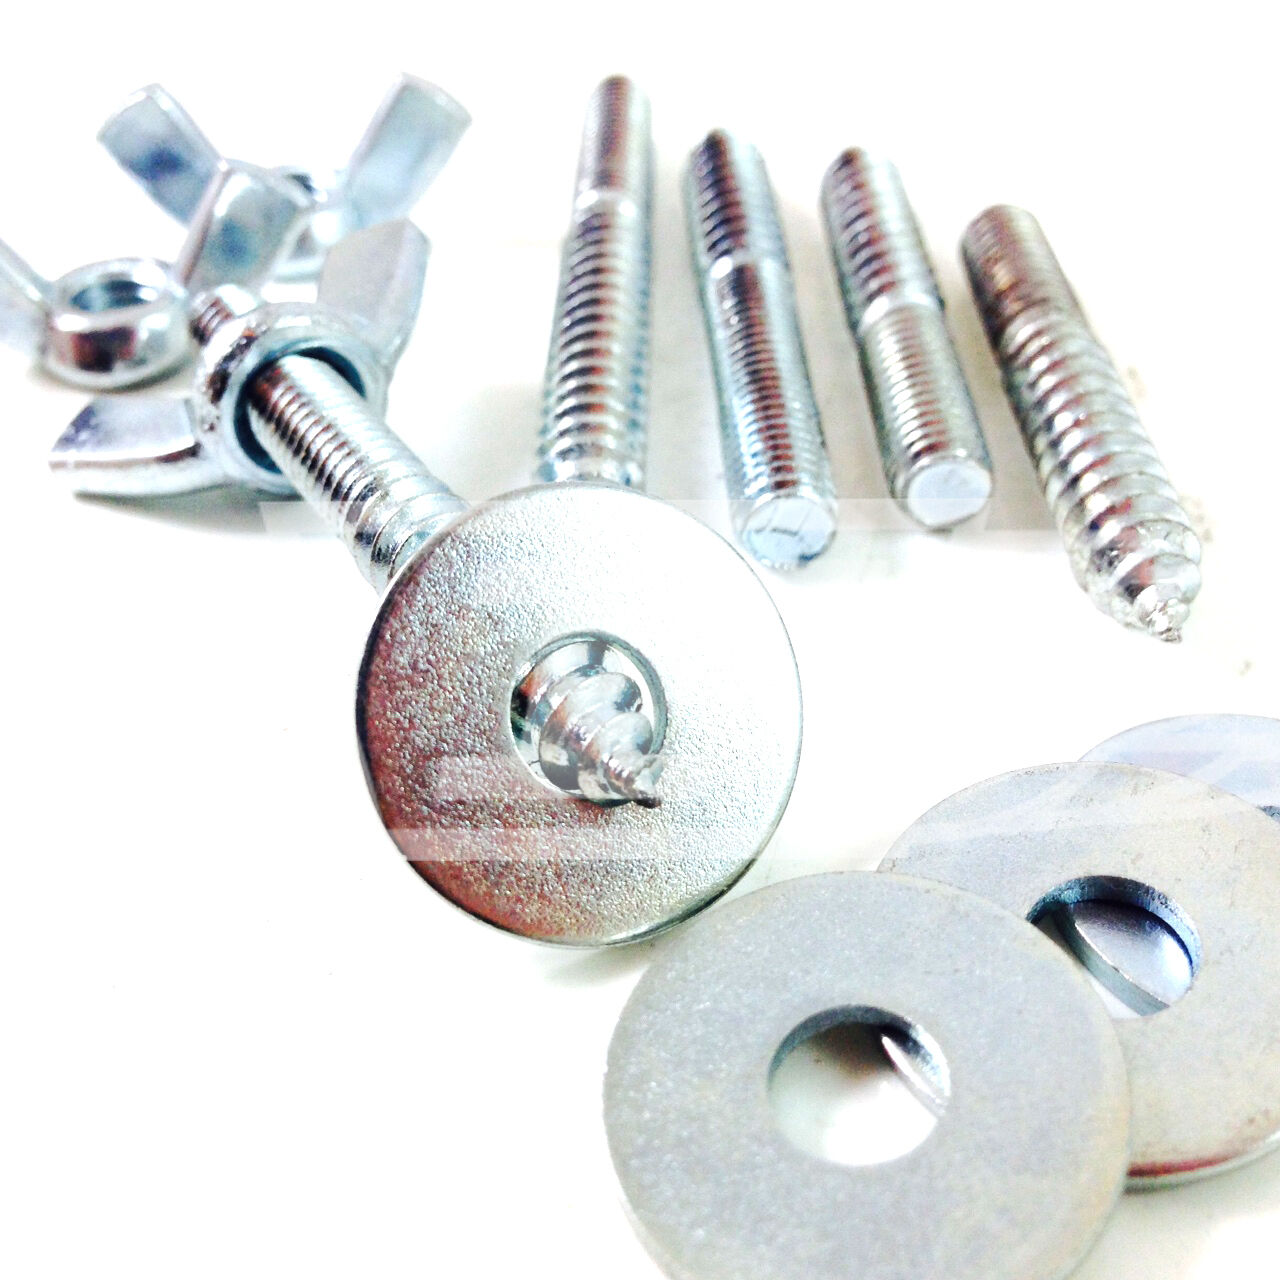 FULL NUTS  FURNITURE FIXING SCREWS WOOD TO METAL DOWELS M6 x 40mm WASHERS